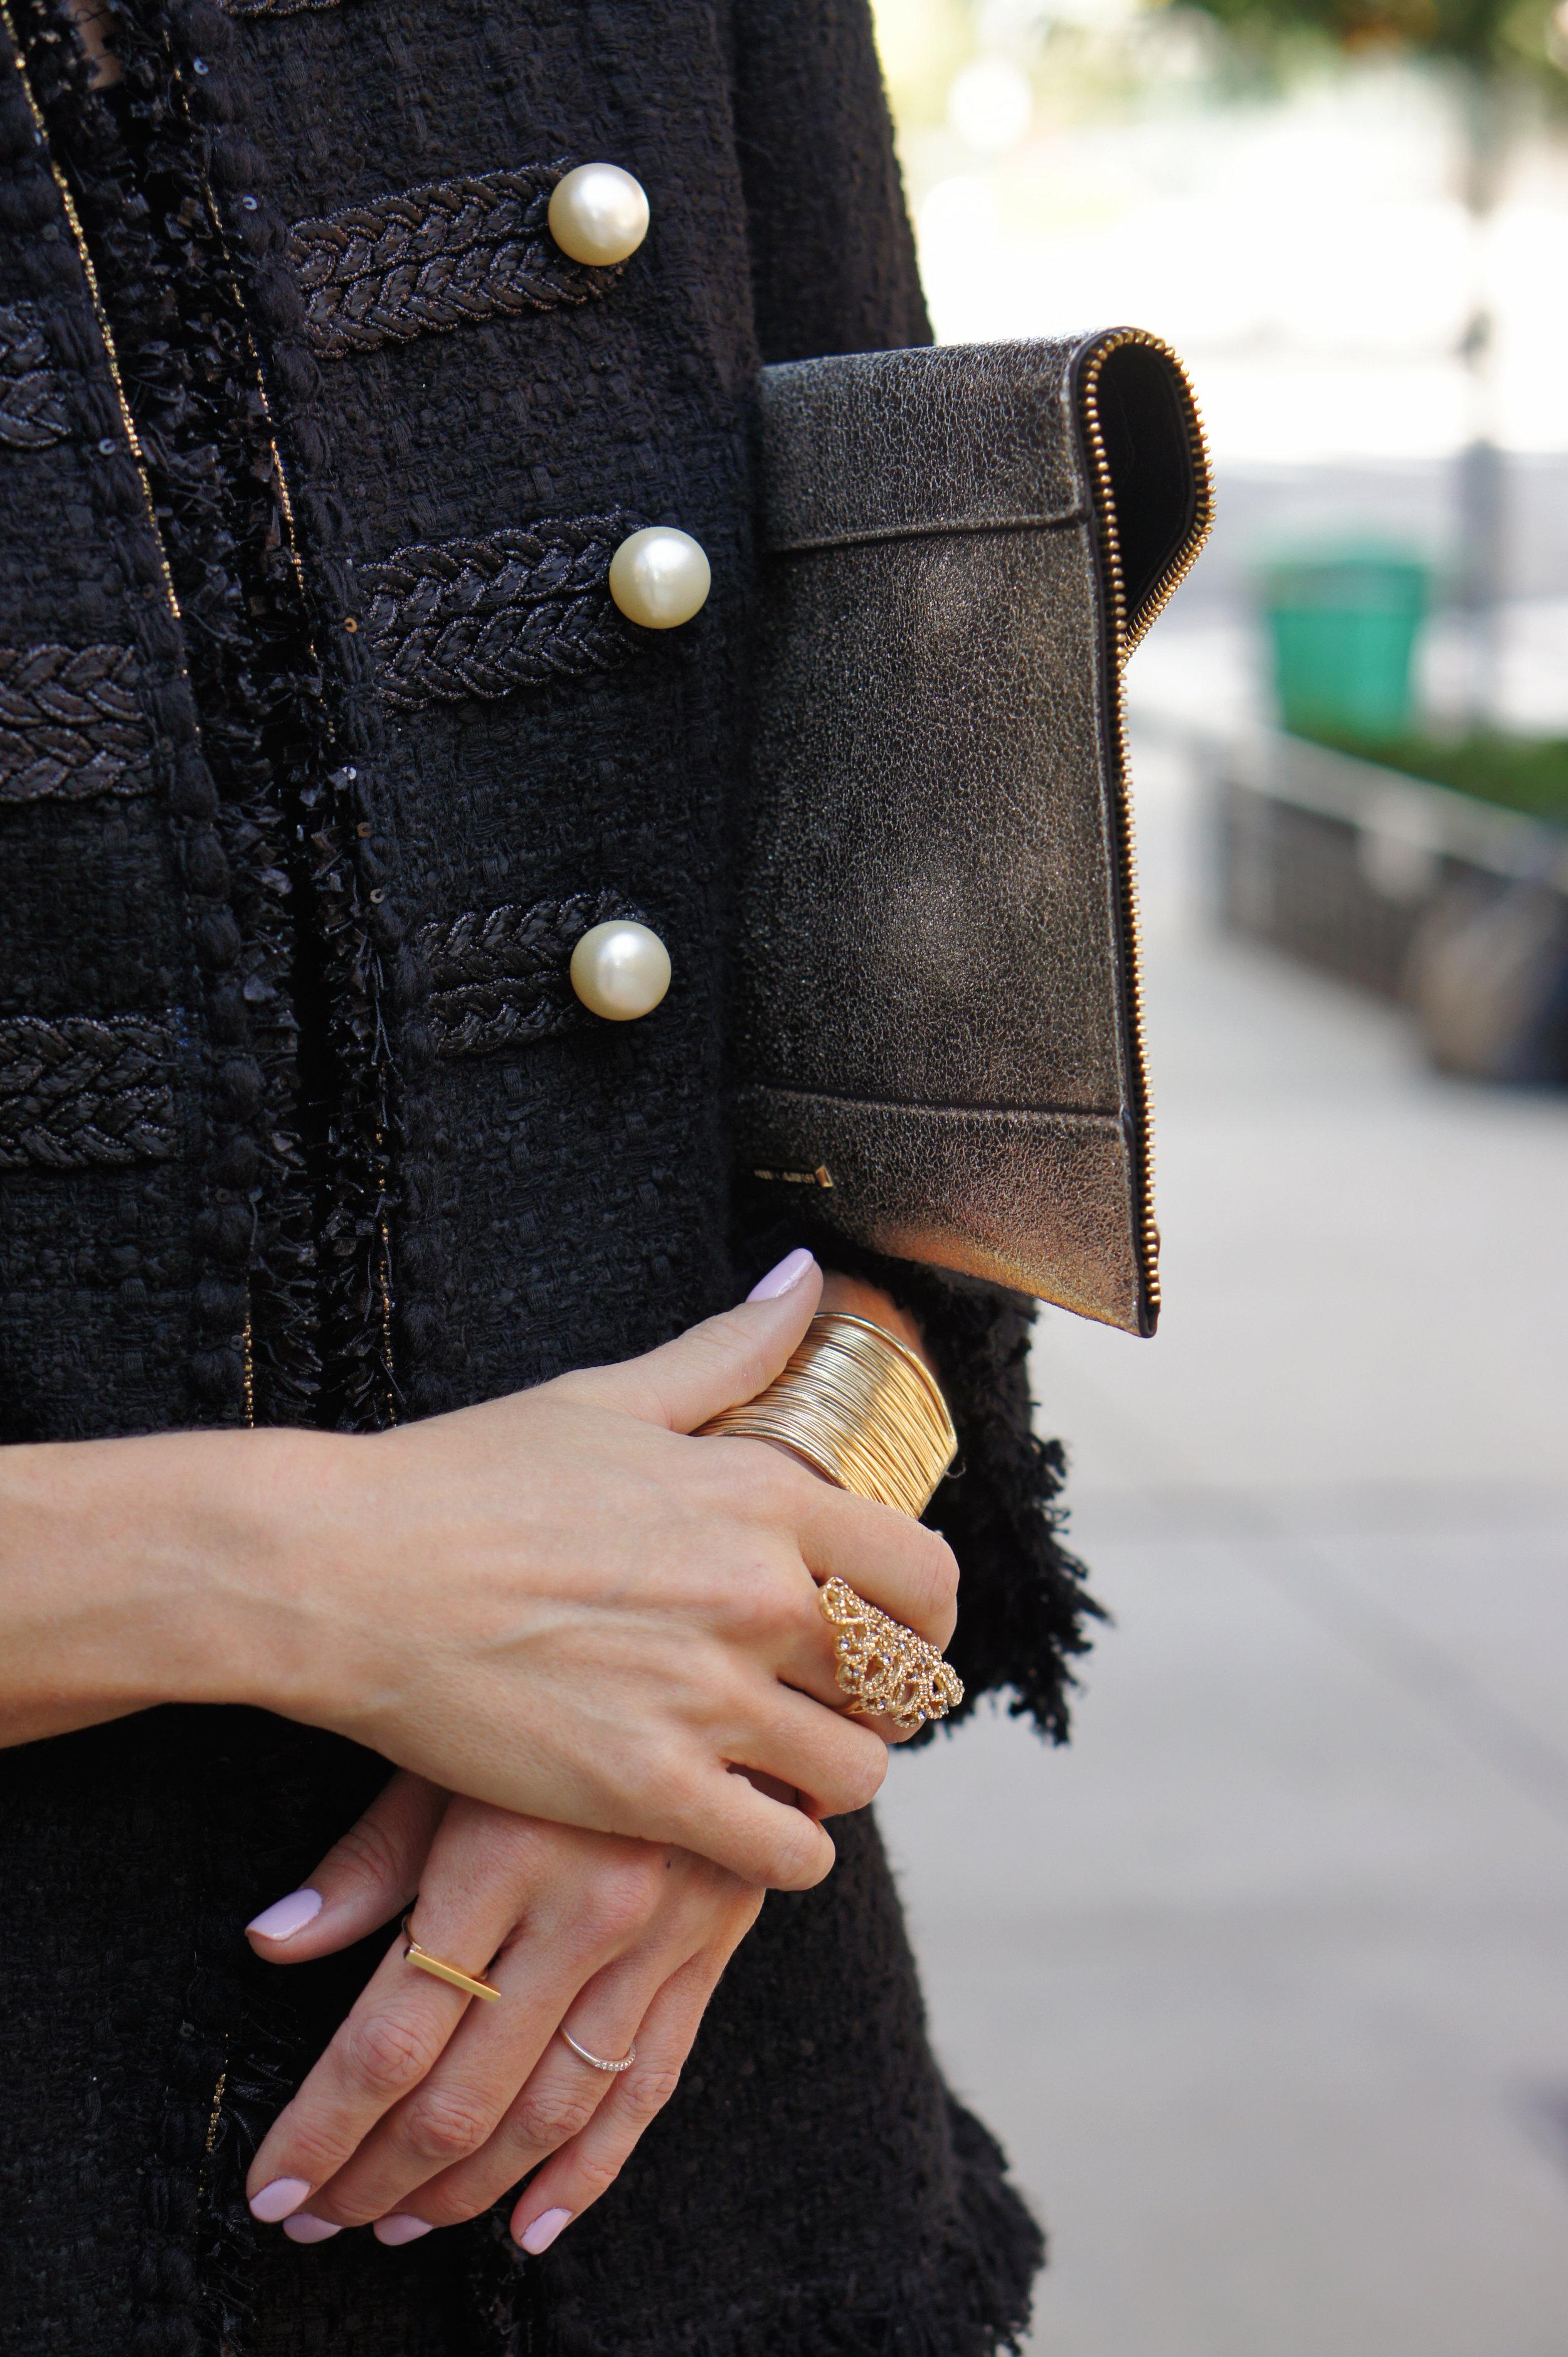 rebecca-minkoff-leo-clutch-black-boots.jpg